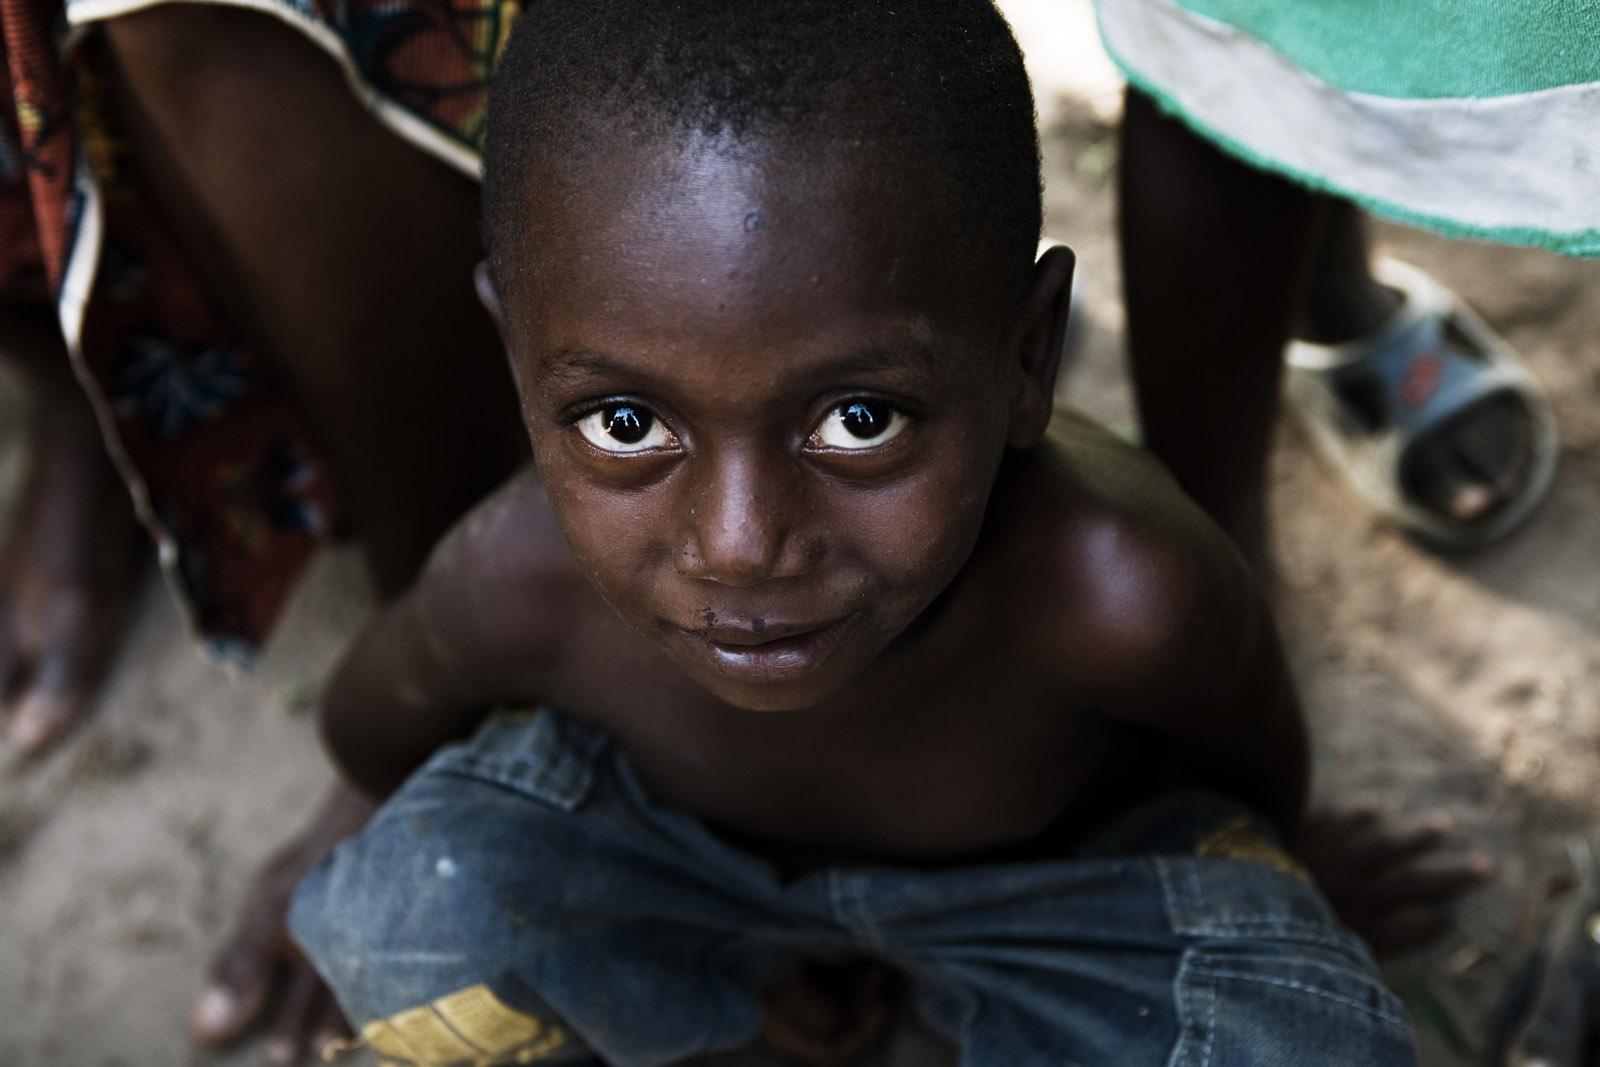 liberia-refugies-ivoiriens-0311-9803hd